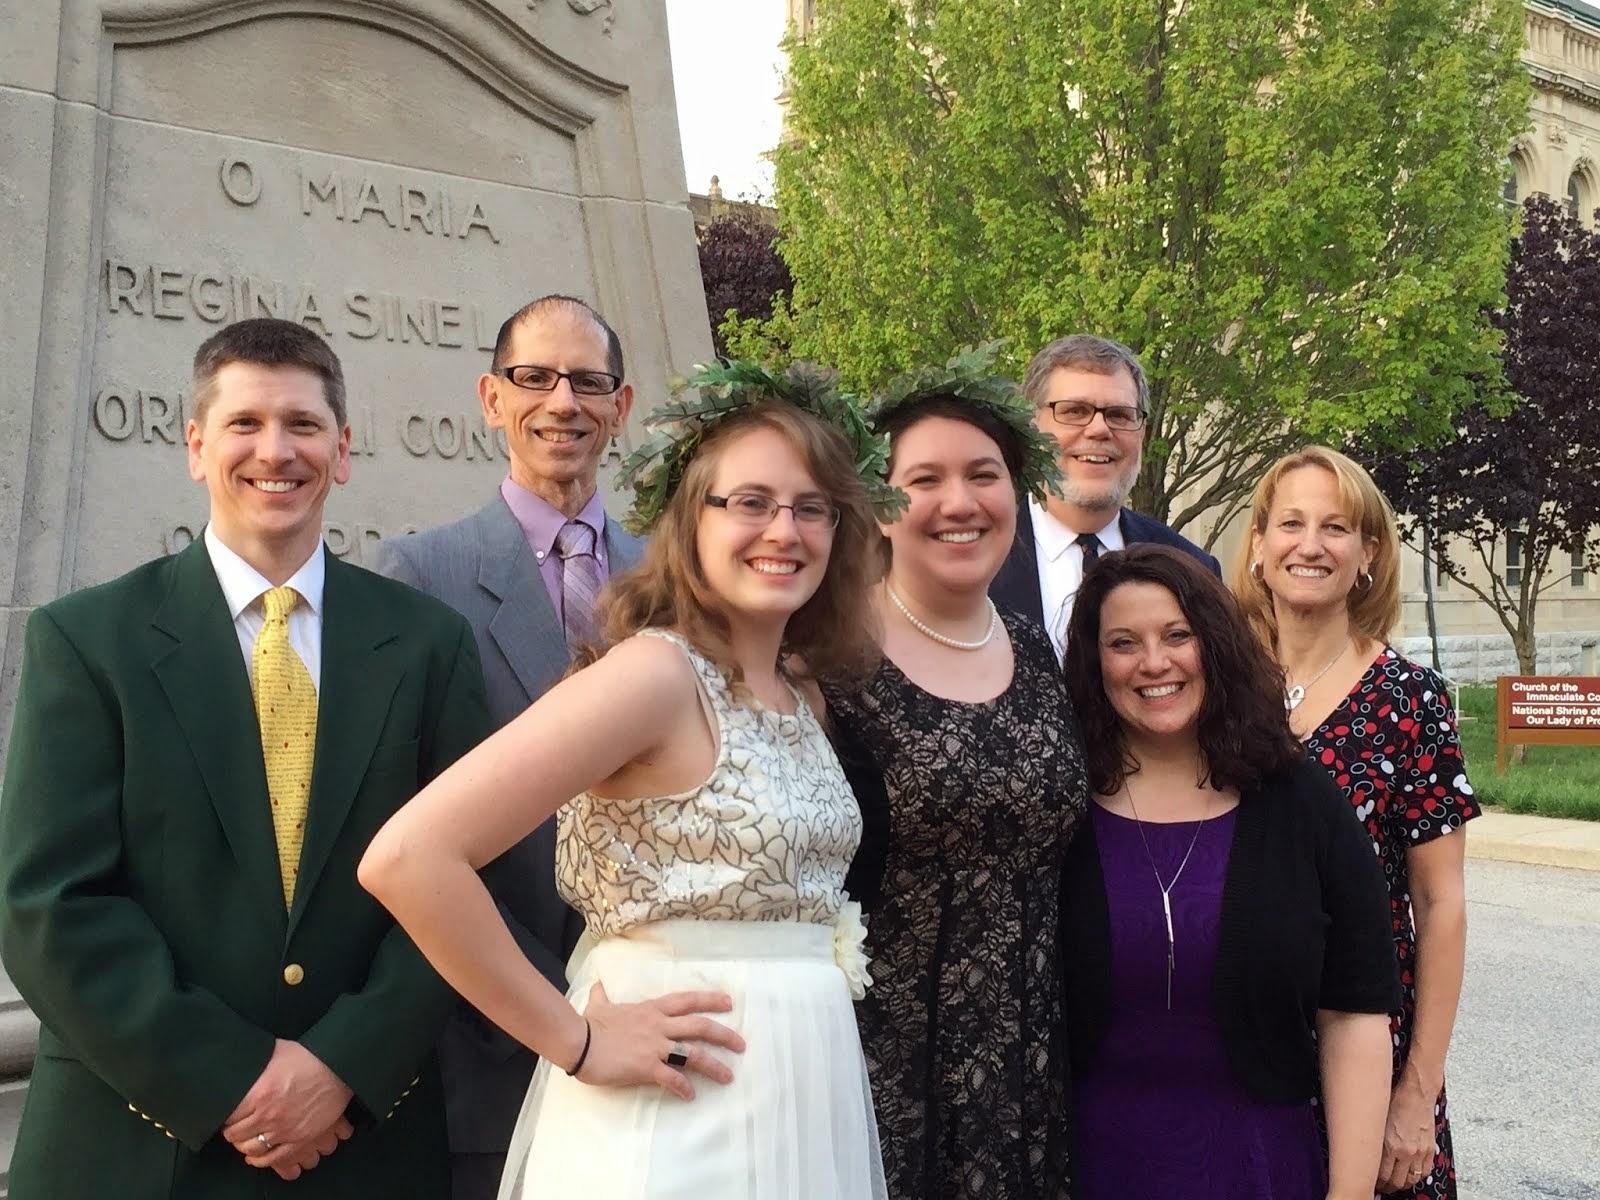 Faculty/Senior Reception 2015